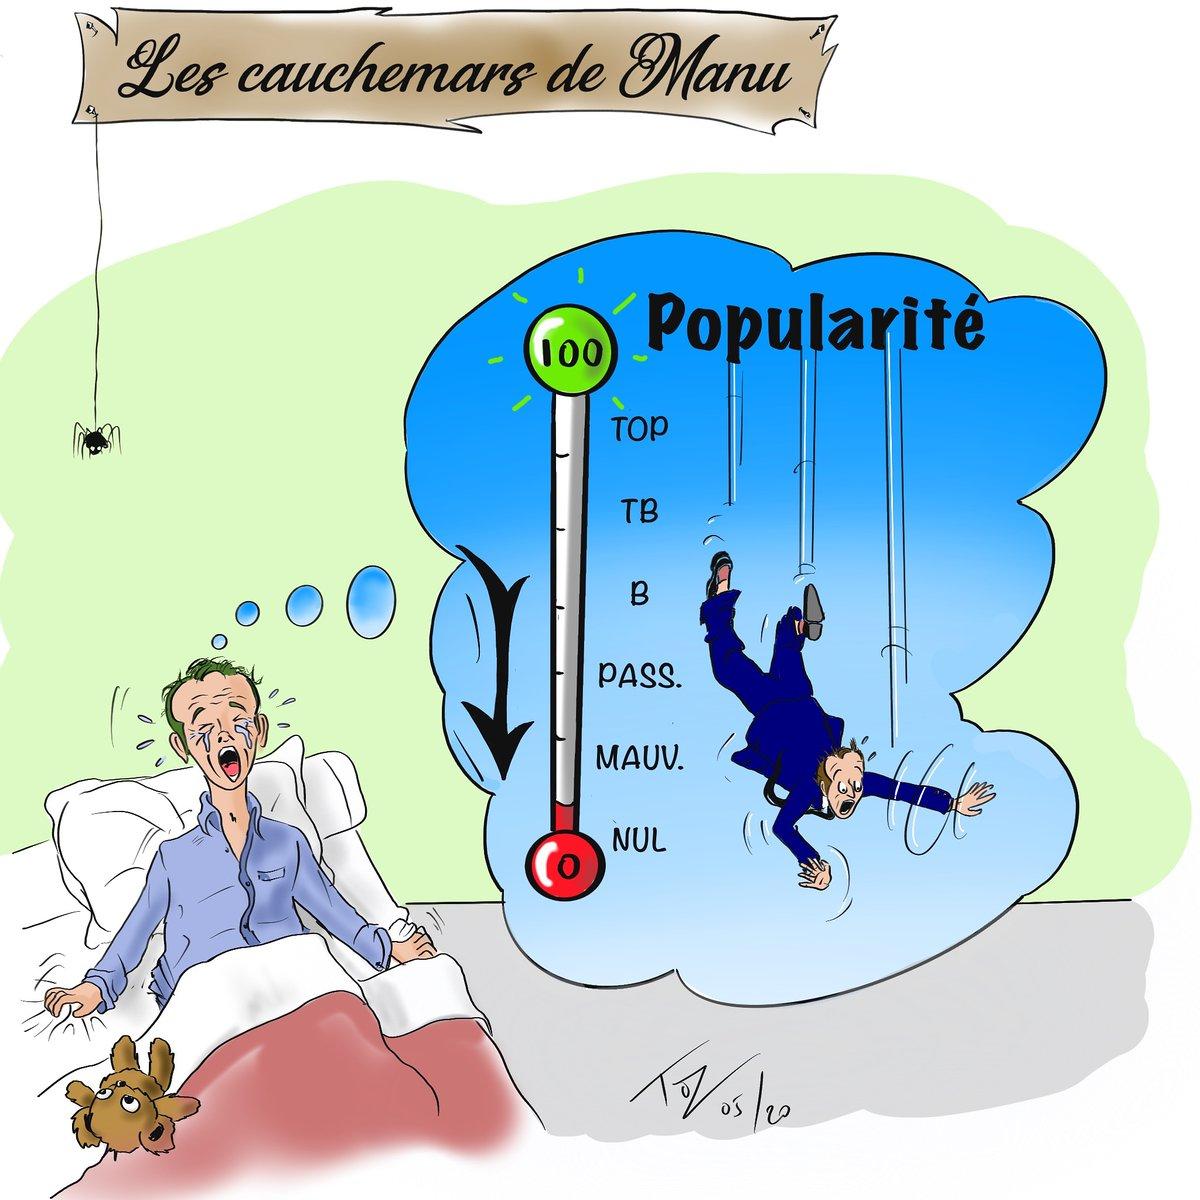 #macron #drawings #opinion #opinions #popular #humour #politique #following #dessinsatirique #macron #sketch #giletsjaunes #france#infos #draw #instagram #dessin #instadraw #instapicture #medias #followers #stayhome #illustration #comics #creativity #art #artist #artworkpic.twitter.com/PyCR02U4oG